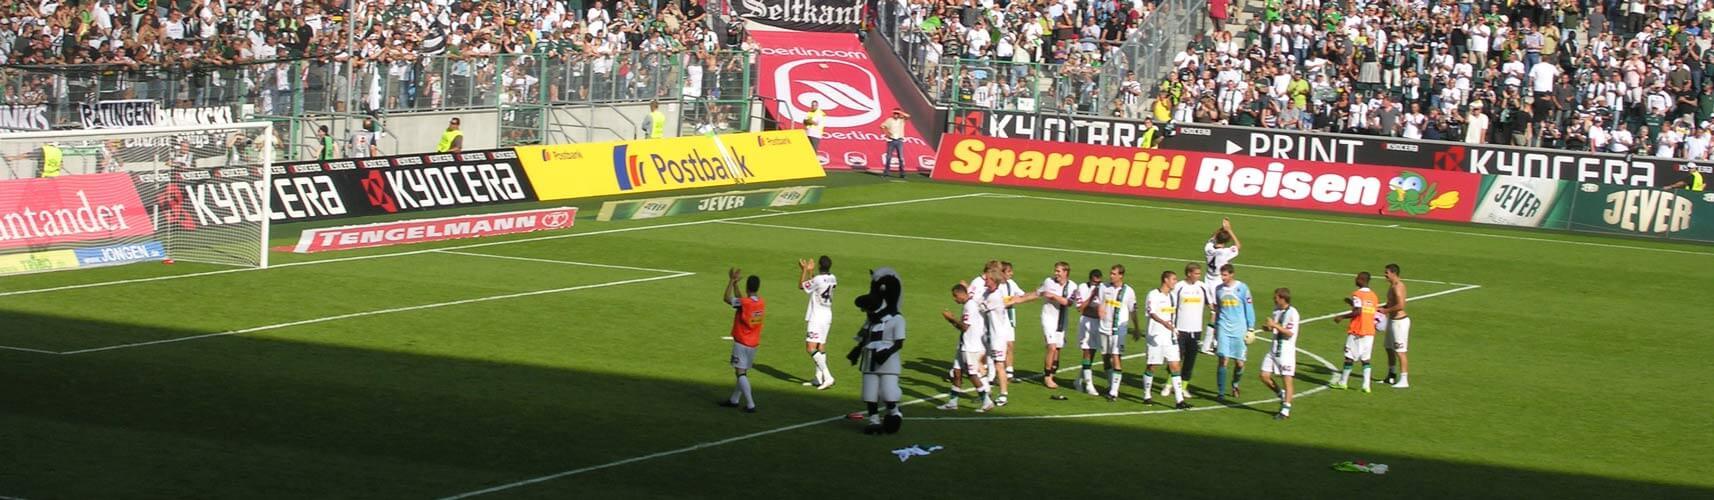 Stadion in Gladbach